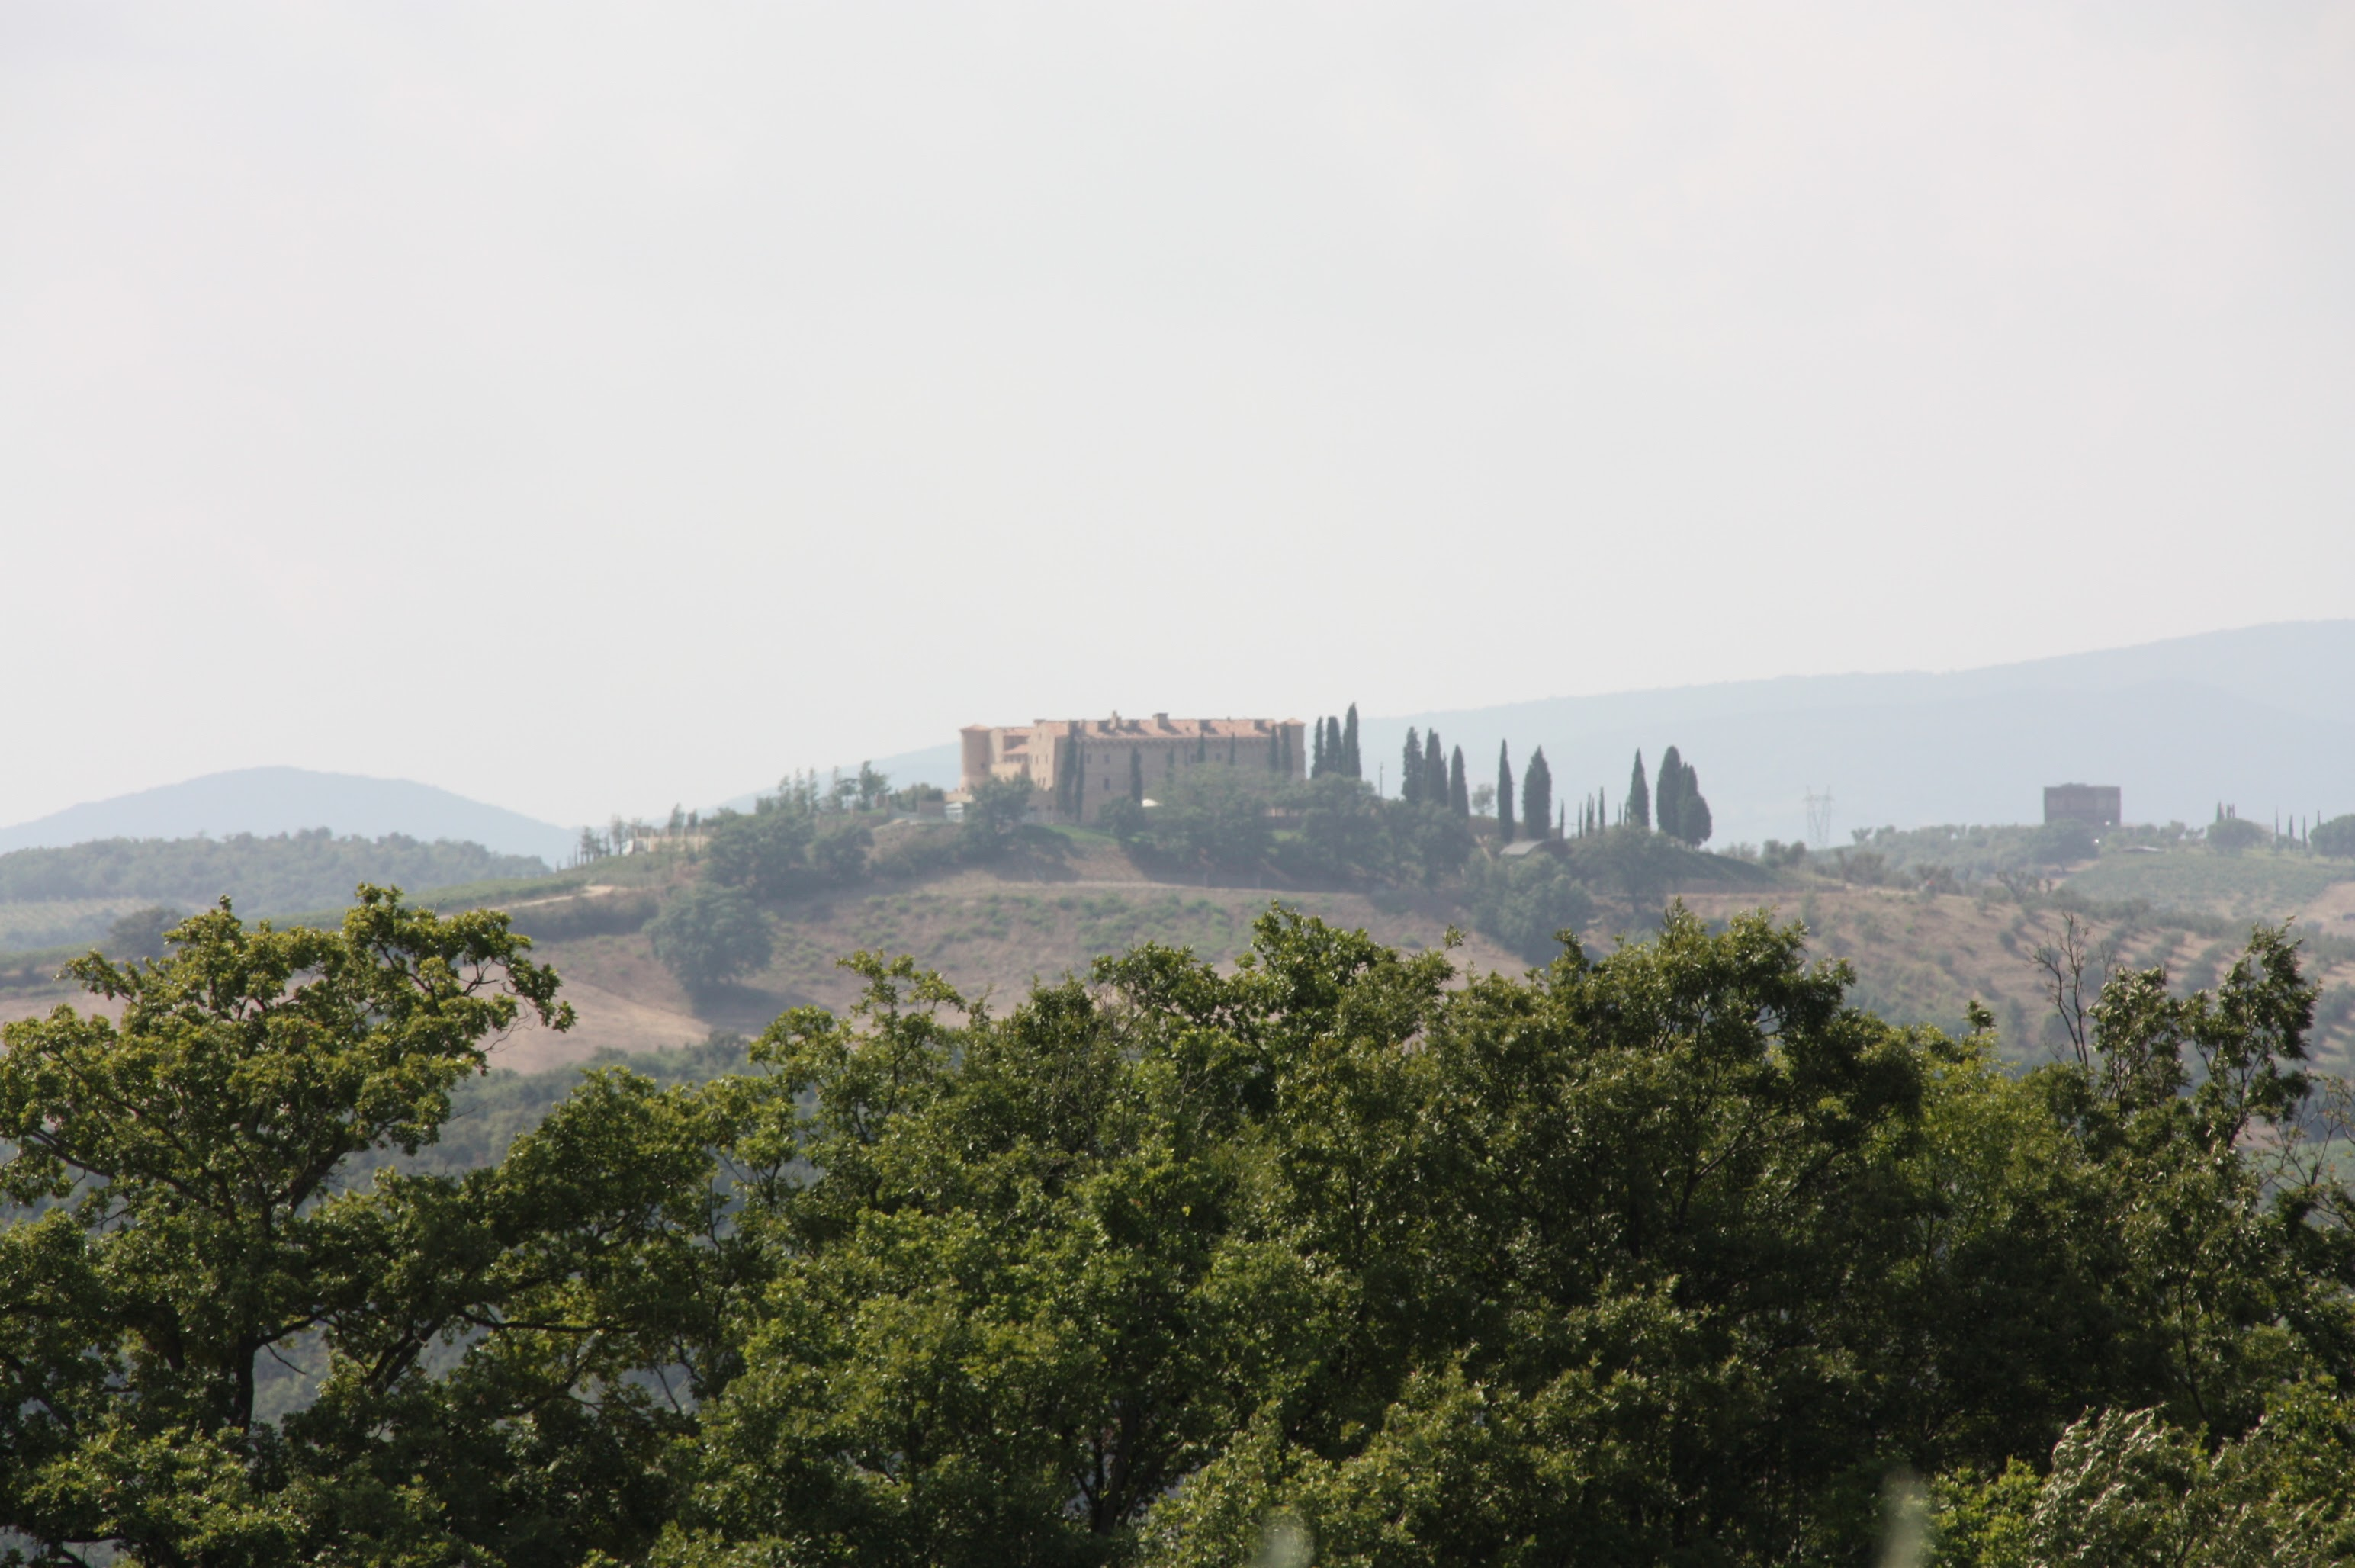 Castello Colle Massari e Cantina Collemassari, in the Montecucco area (Cinigiano)